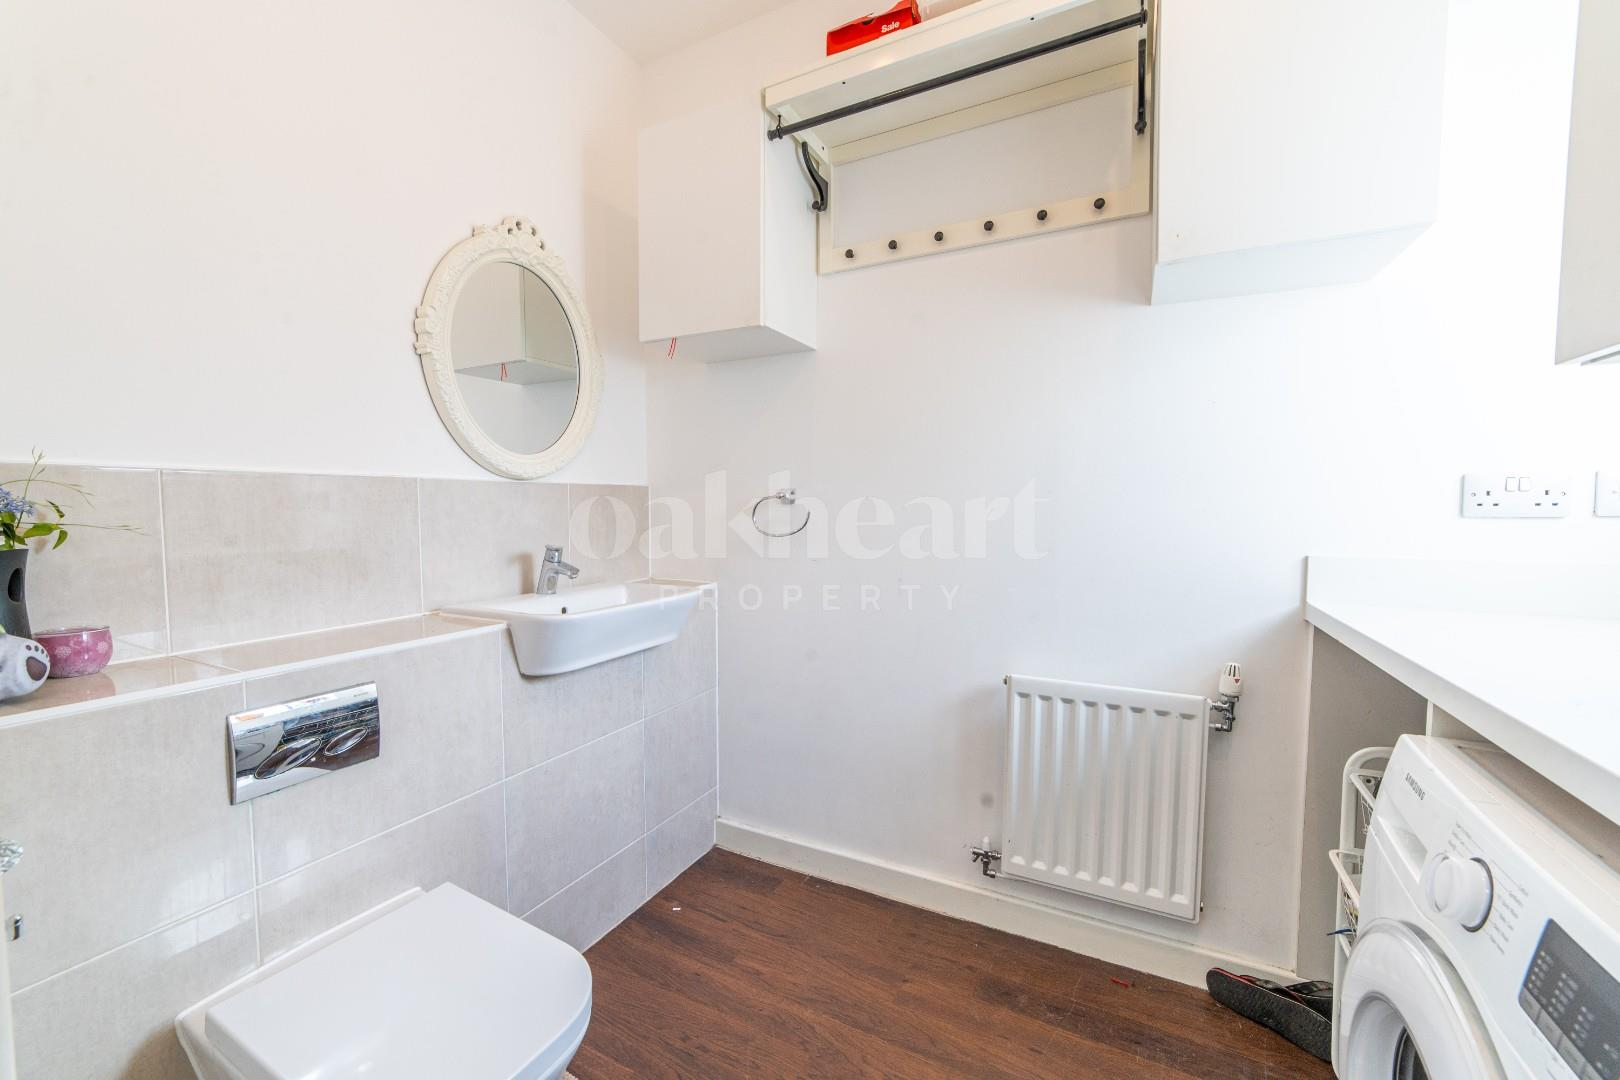 Cloakroom/ Utility Room